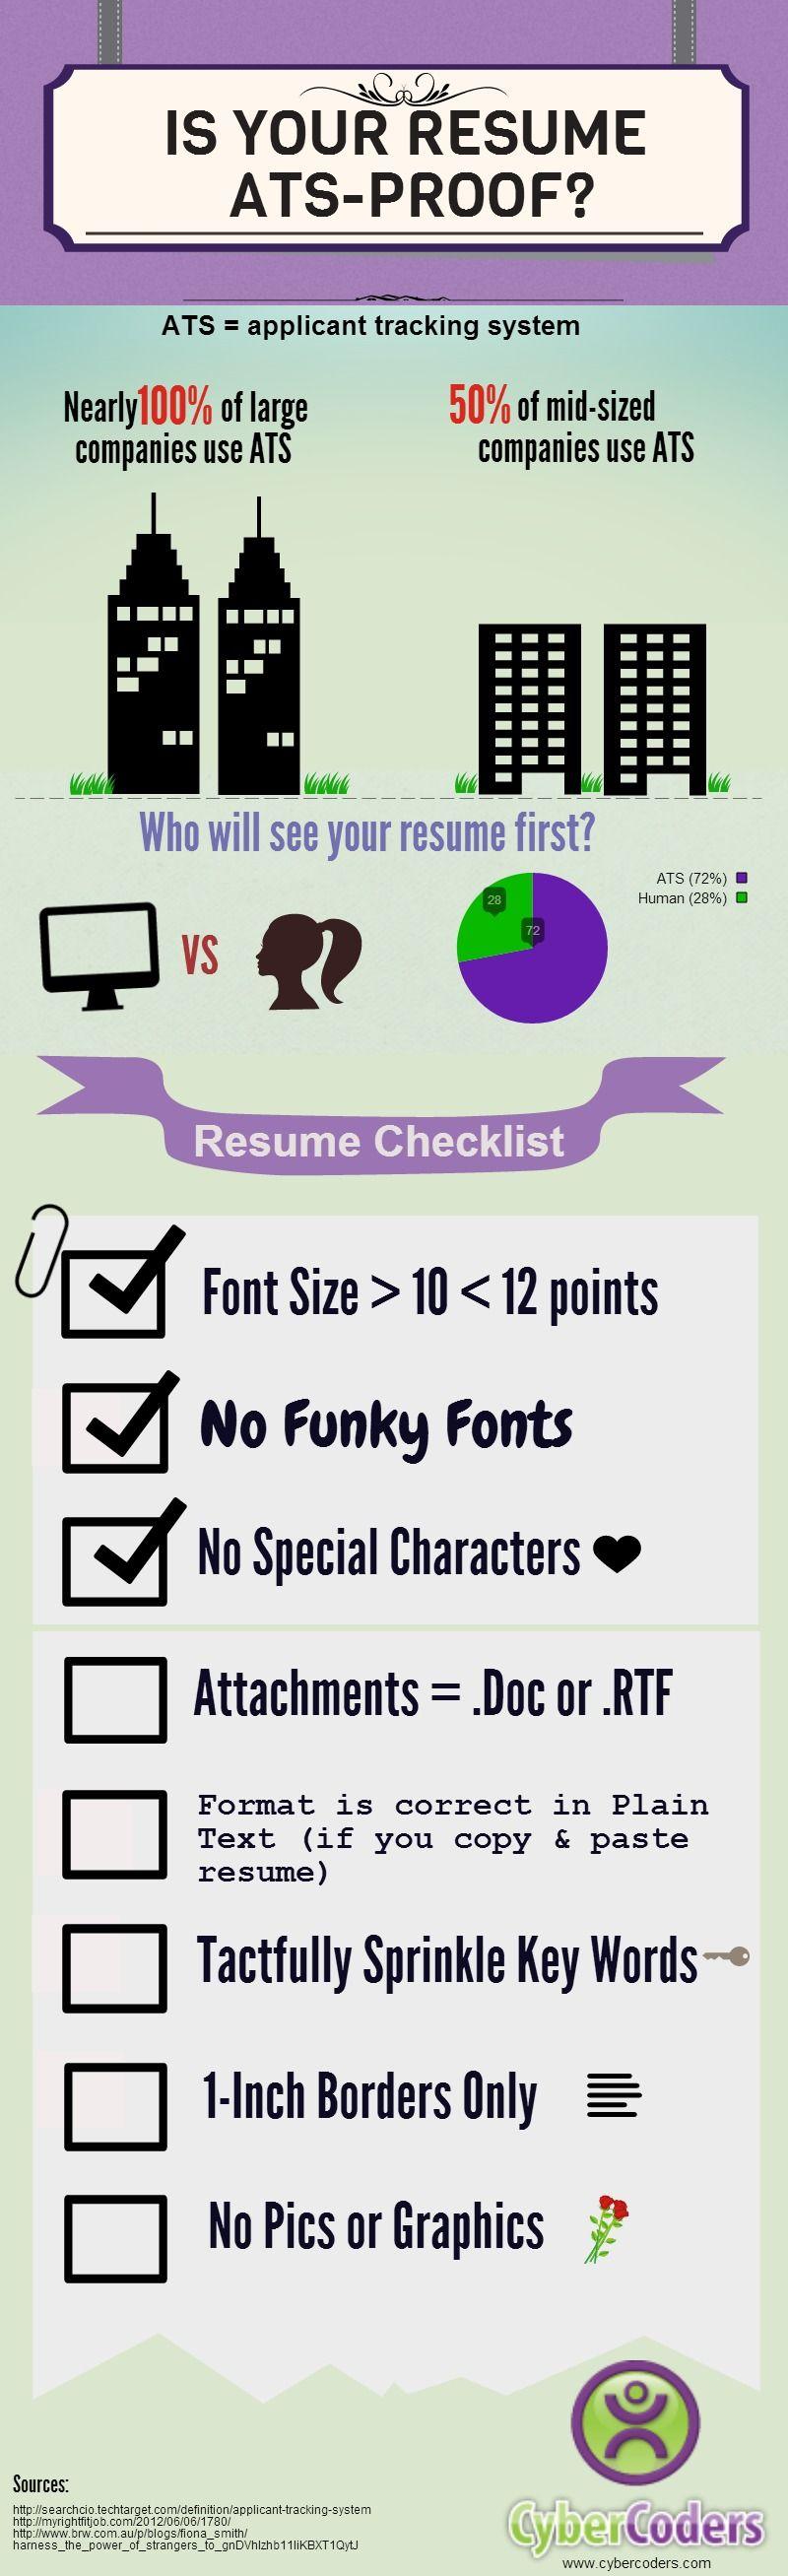 Job resume help